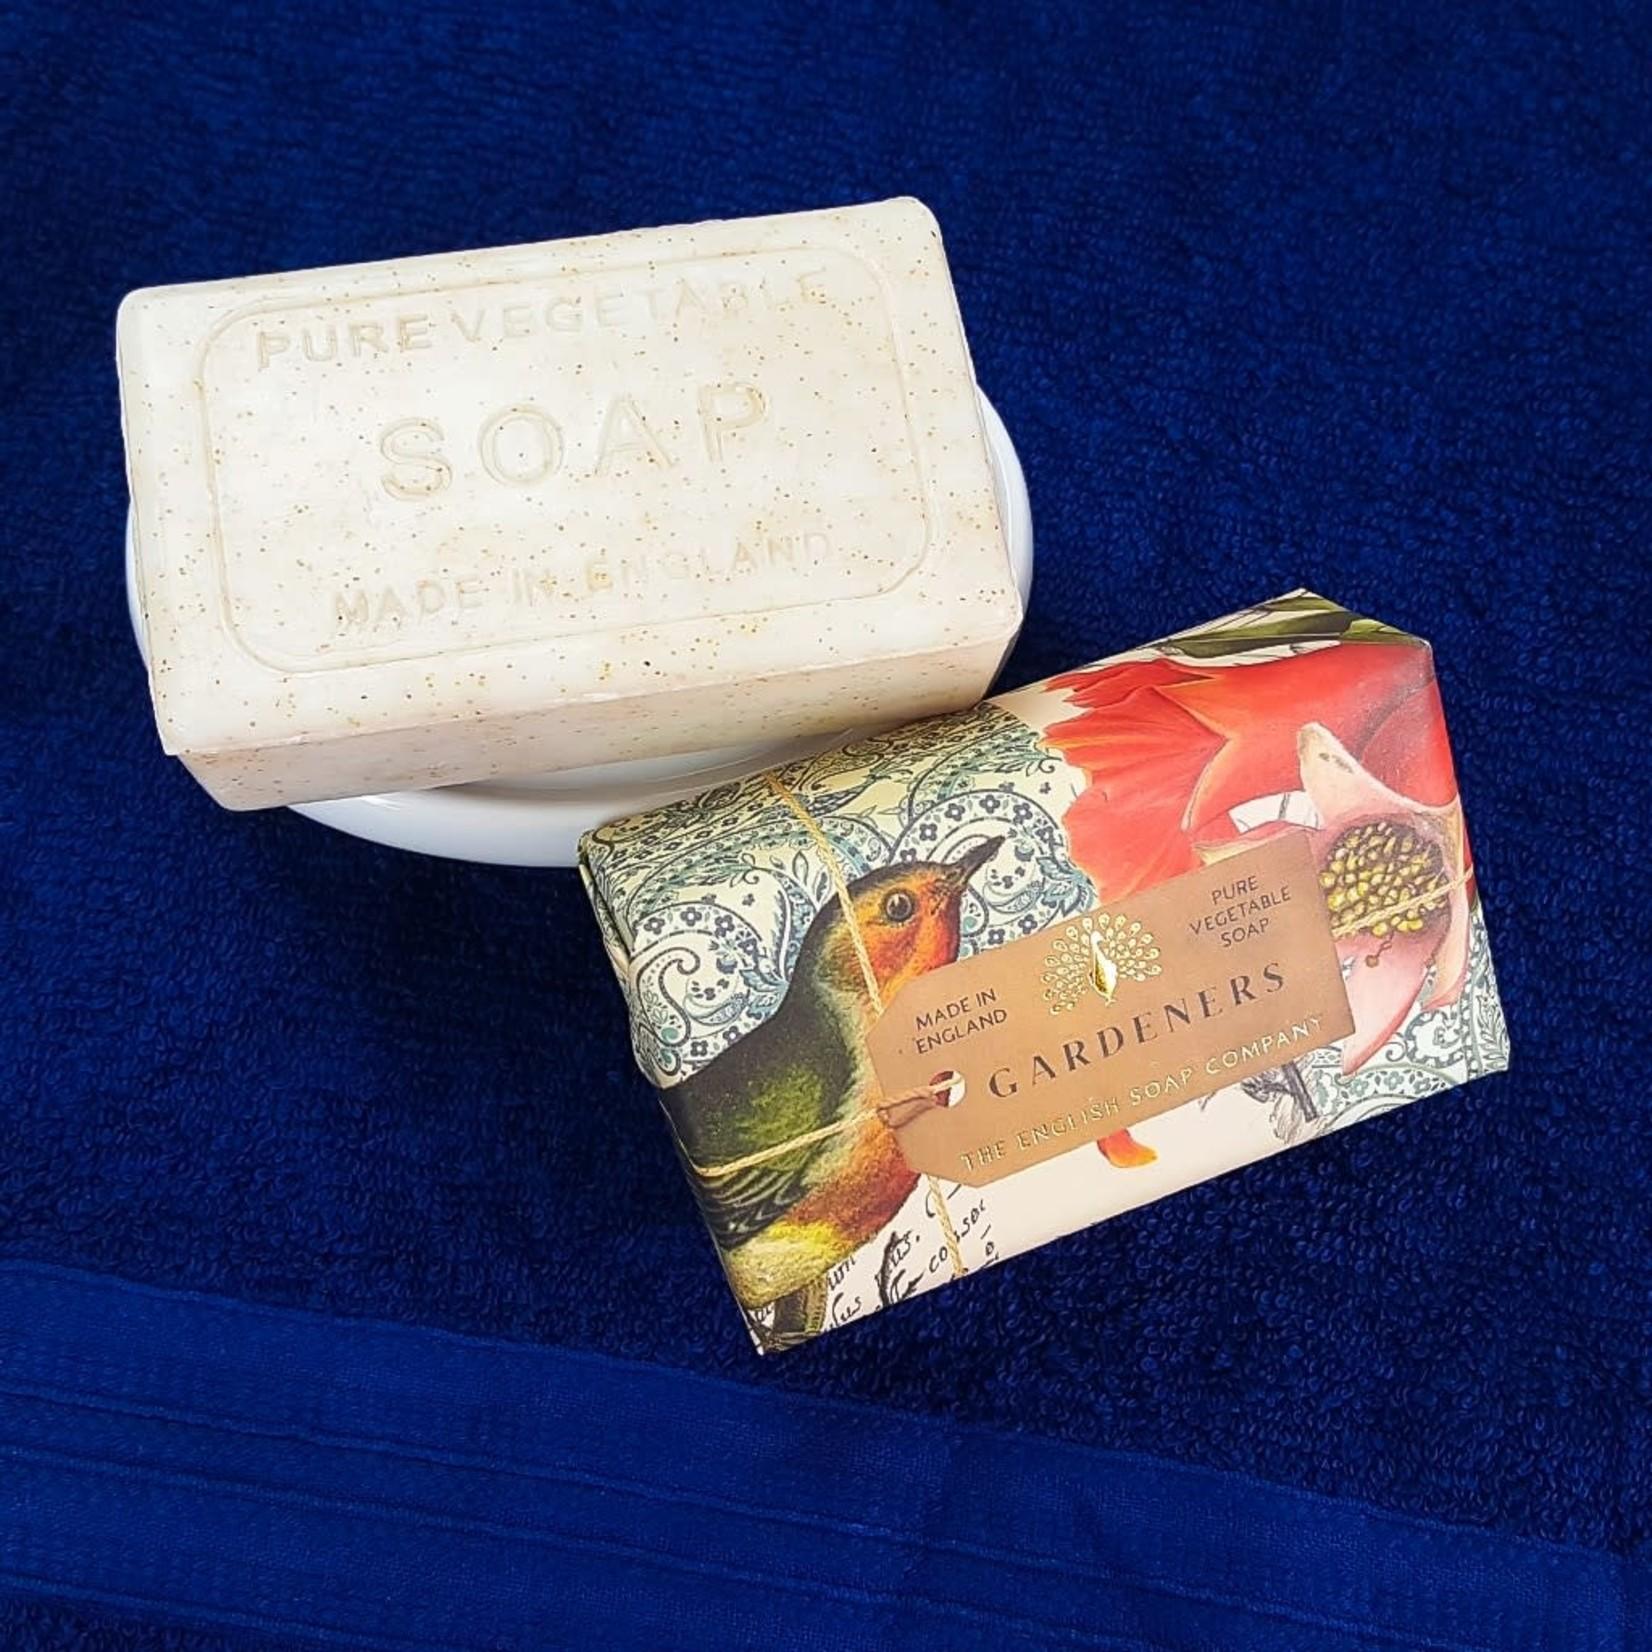 English Soap Company Gardeners Exfoliating Soap 190g